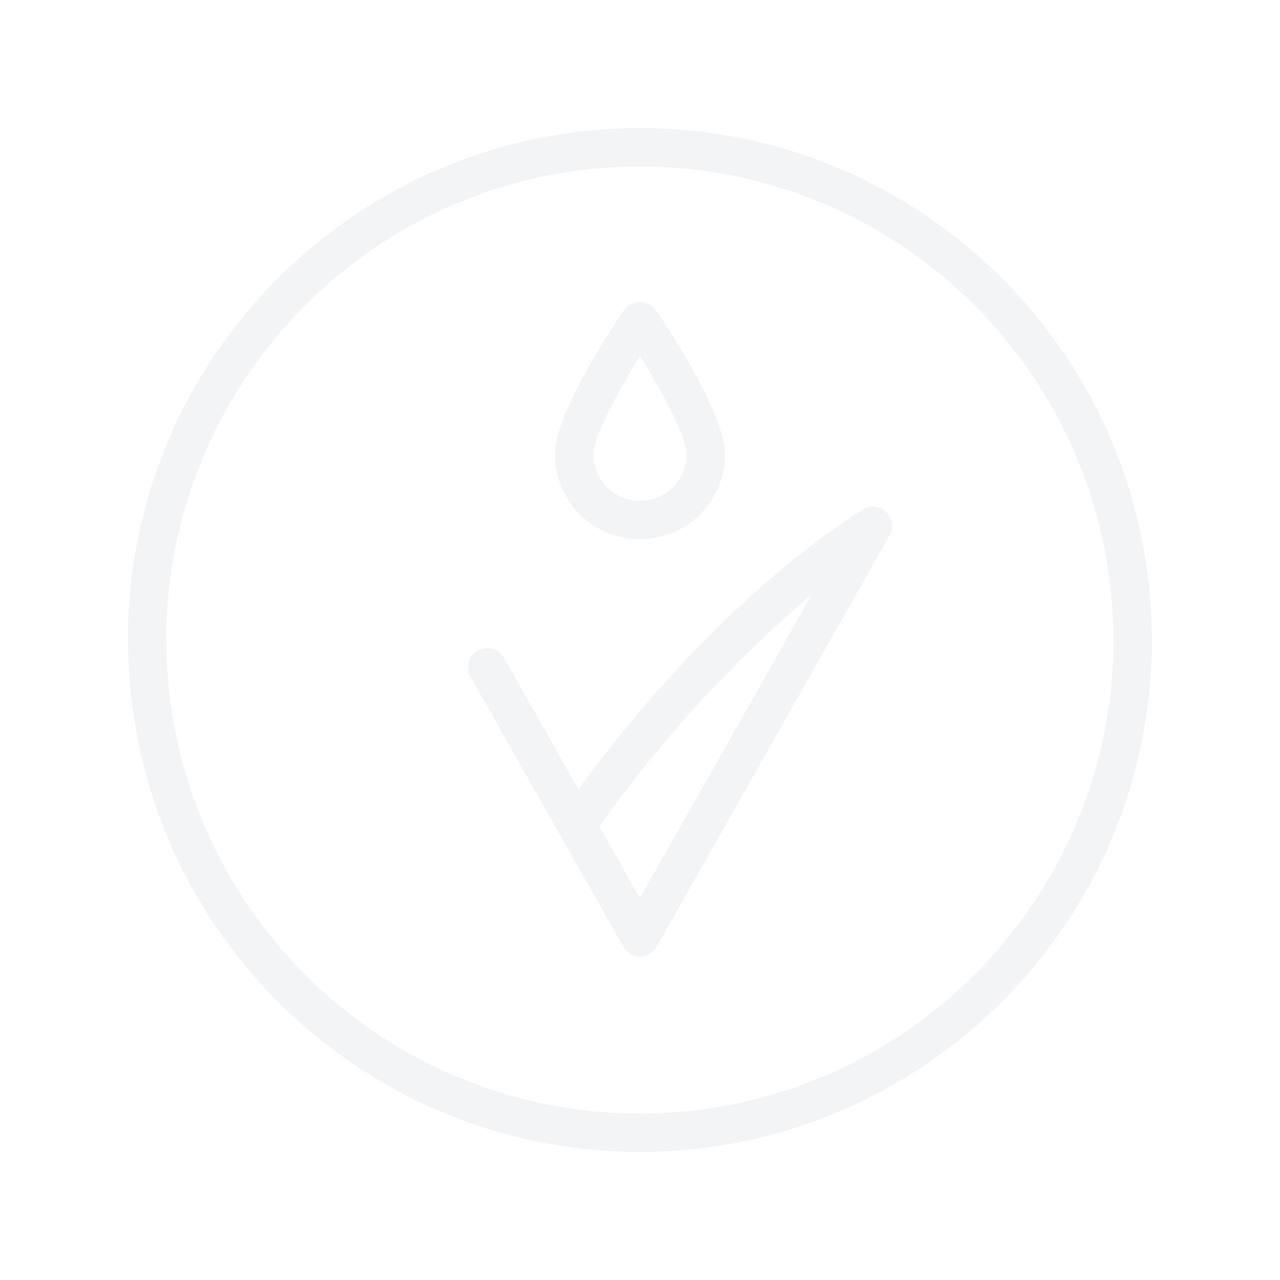 MADARA Infusion Vert Firming Antioxidant Body Oil укрепляющее масло для тела 200ml